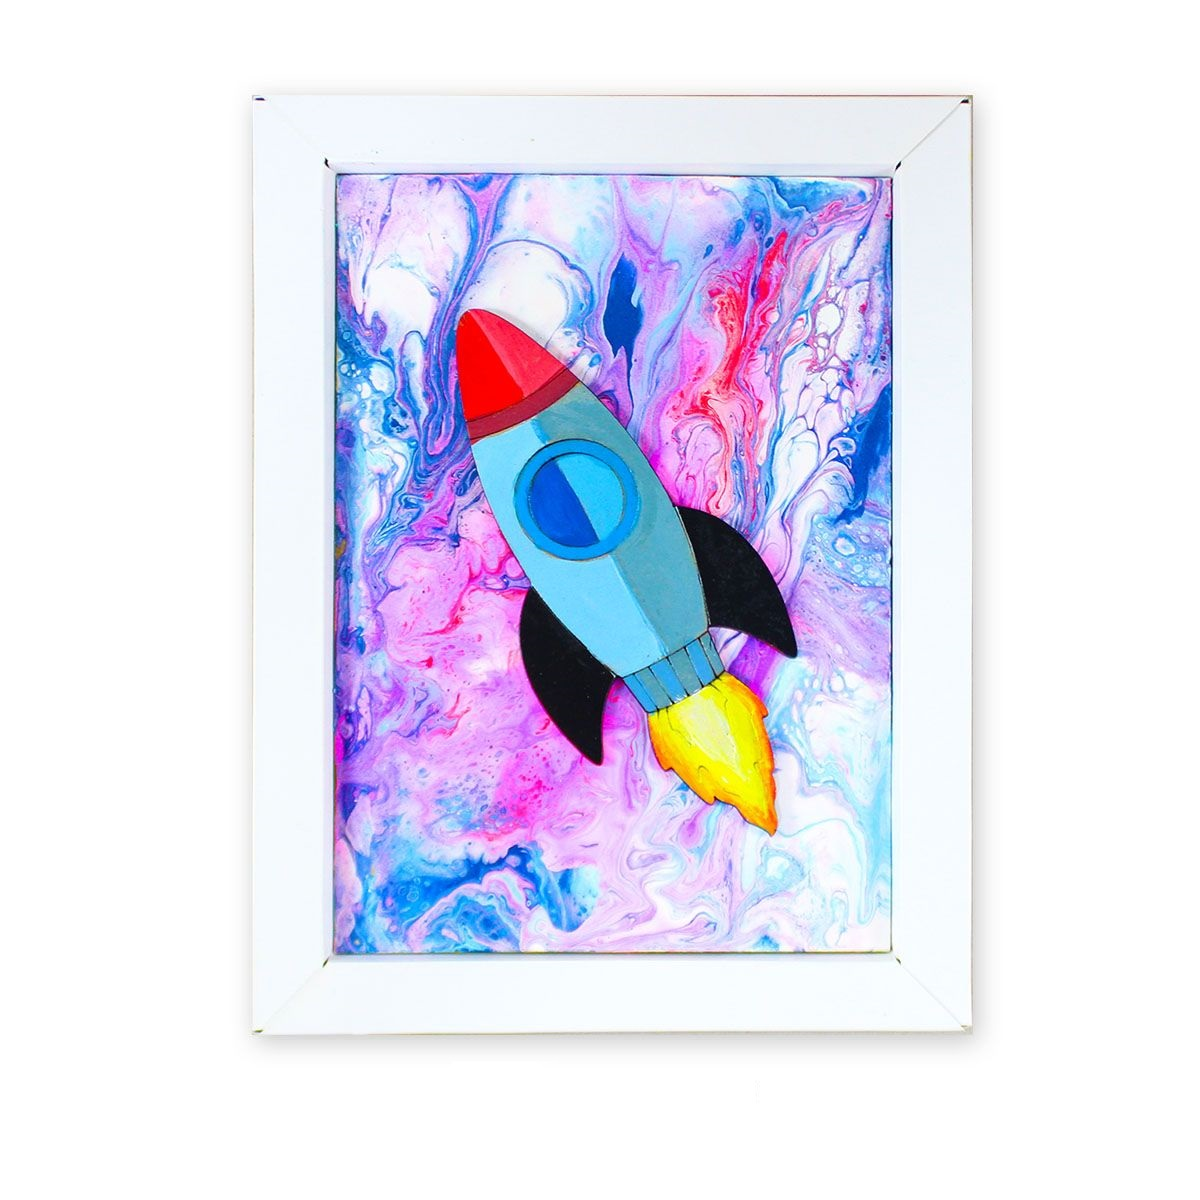 pour-art-kit-space-08